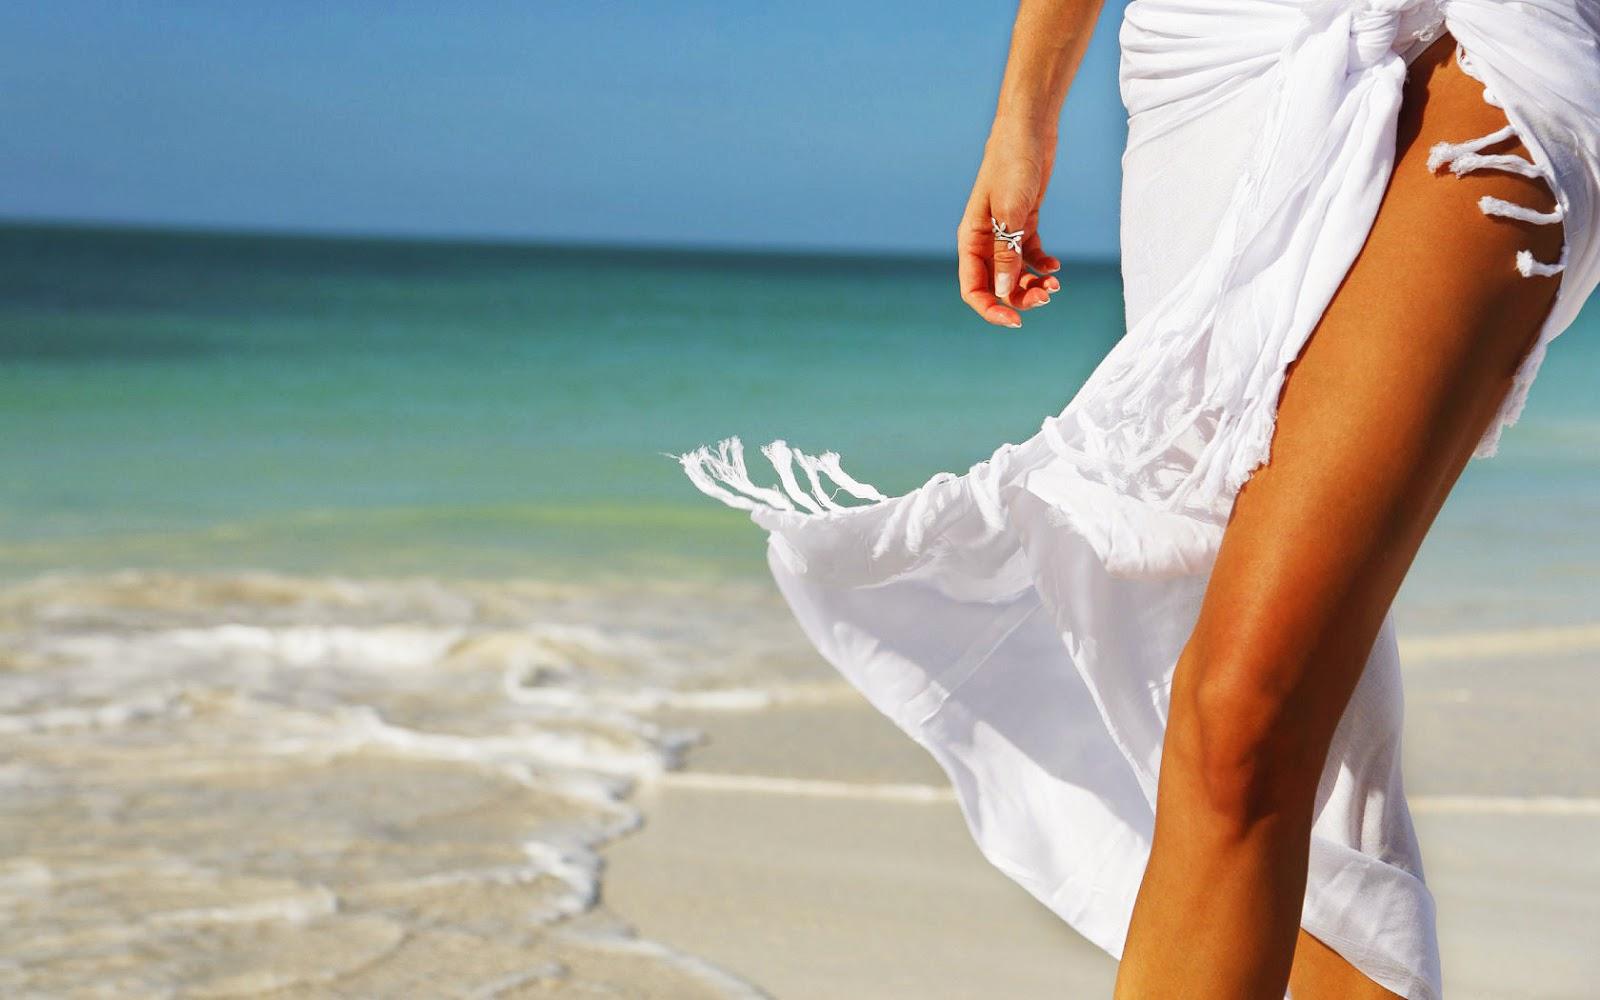 Foto met strand, zee en vrouw in witte jurk